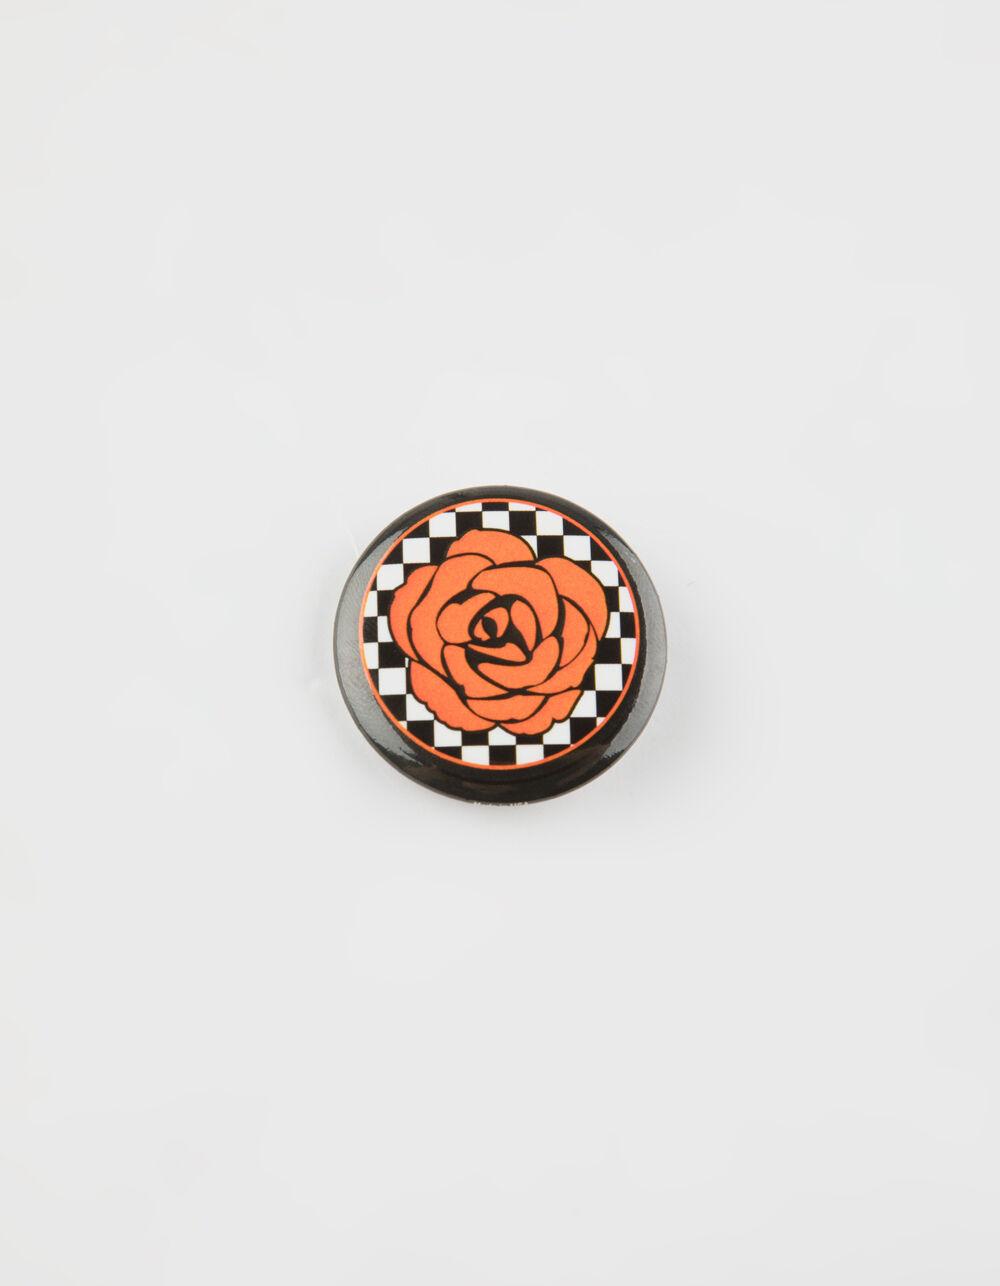 Image of ROSE CHECKER PIN